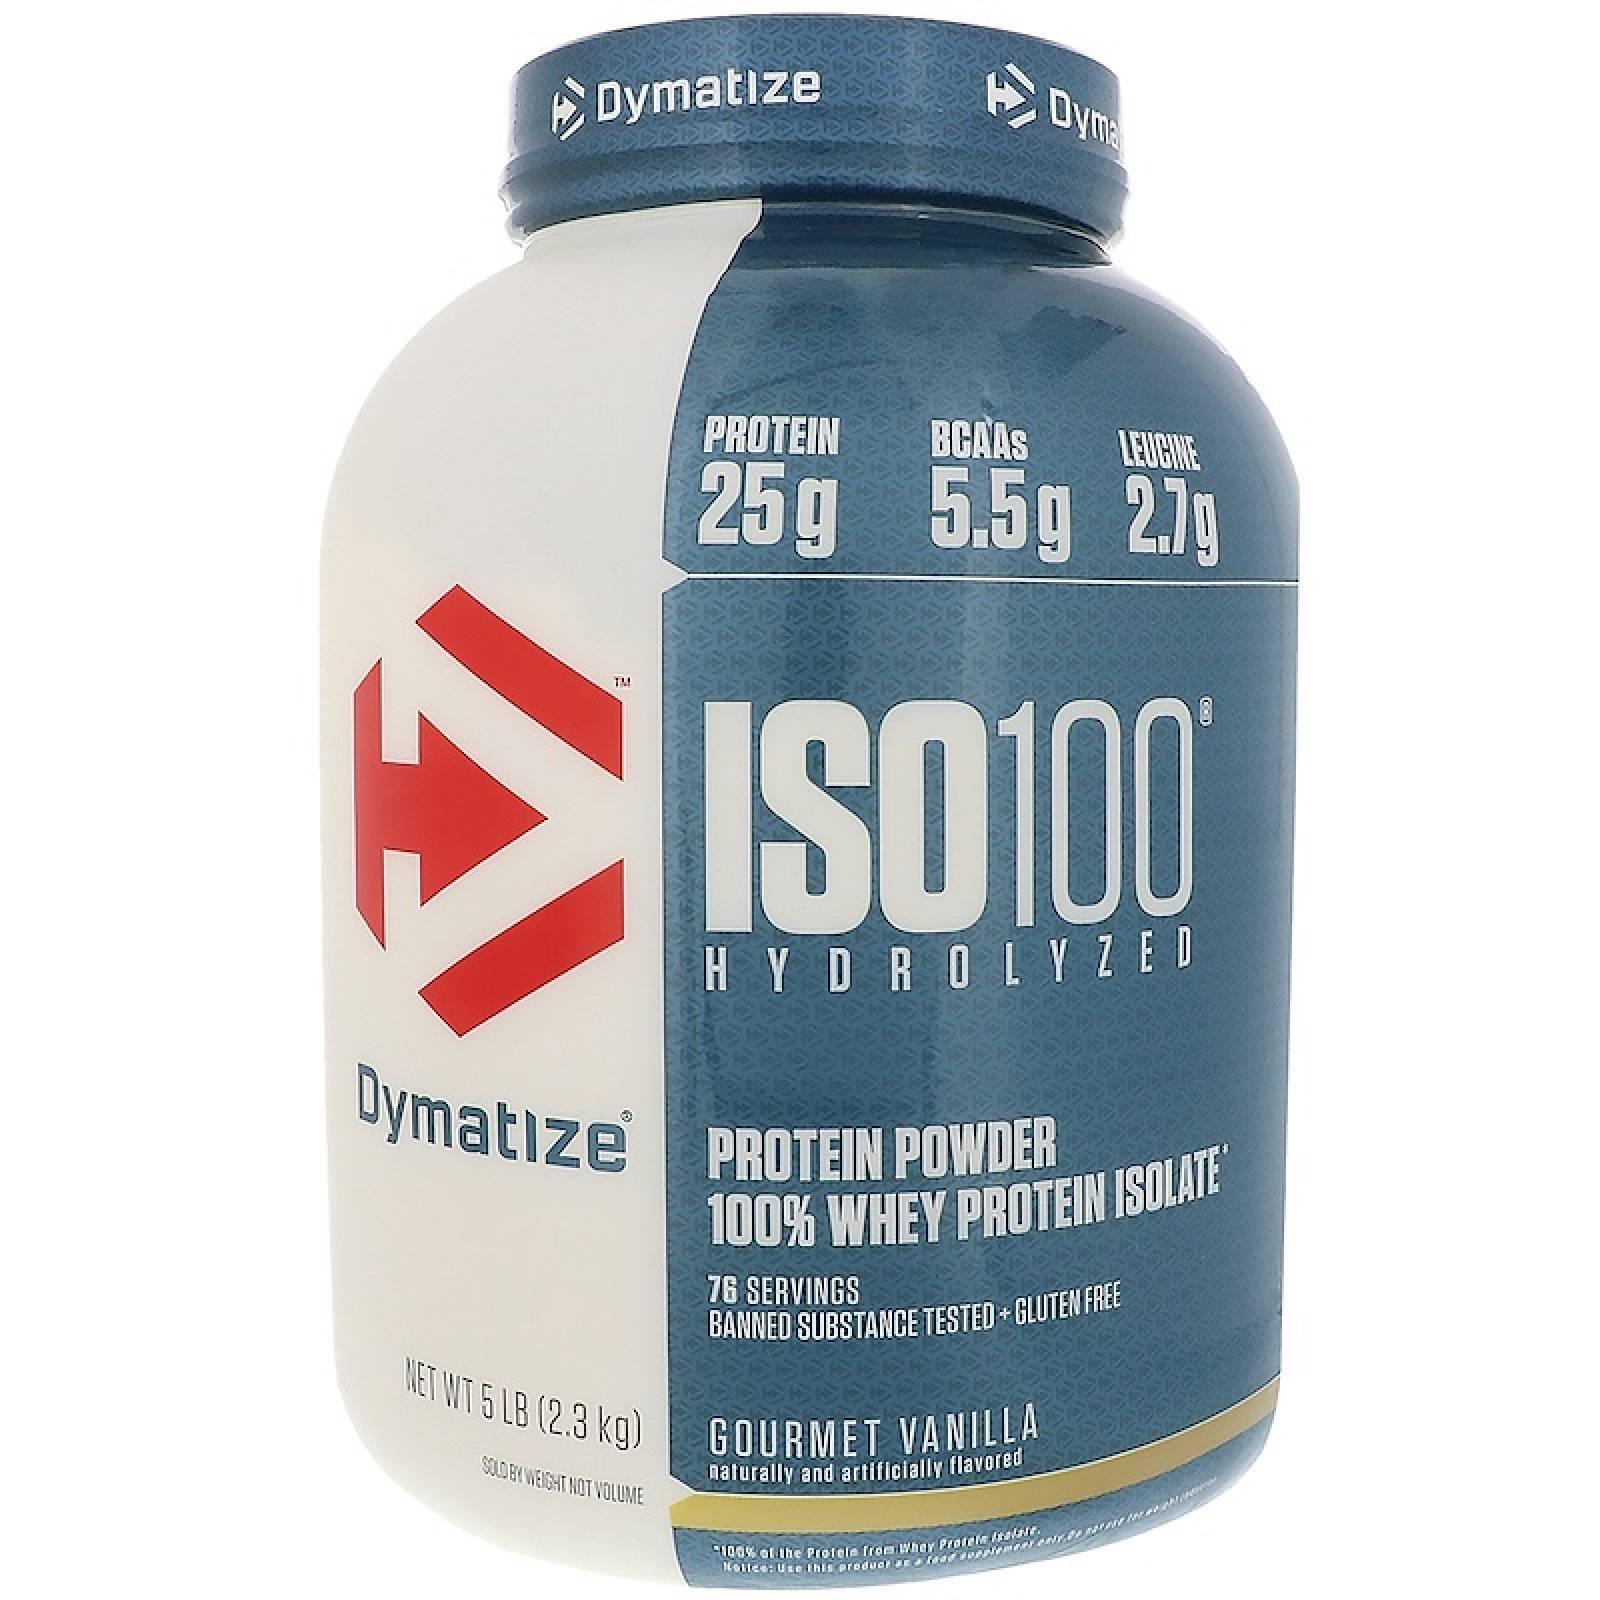 Proteina Dymatize Iso 100  5lbs Sabor Vainilla